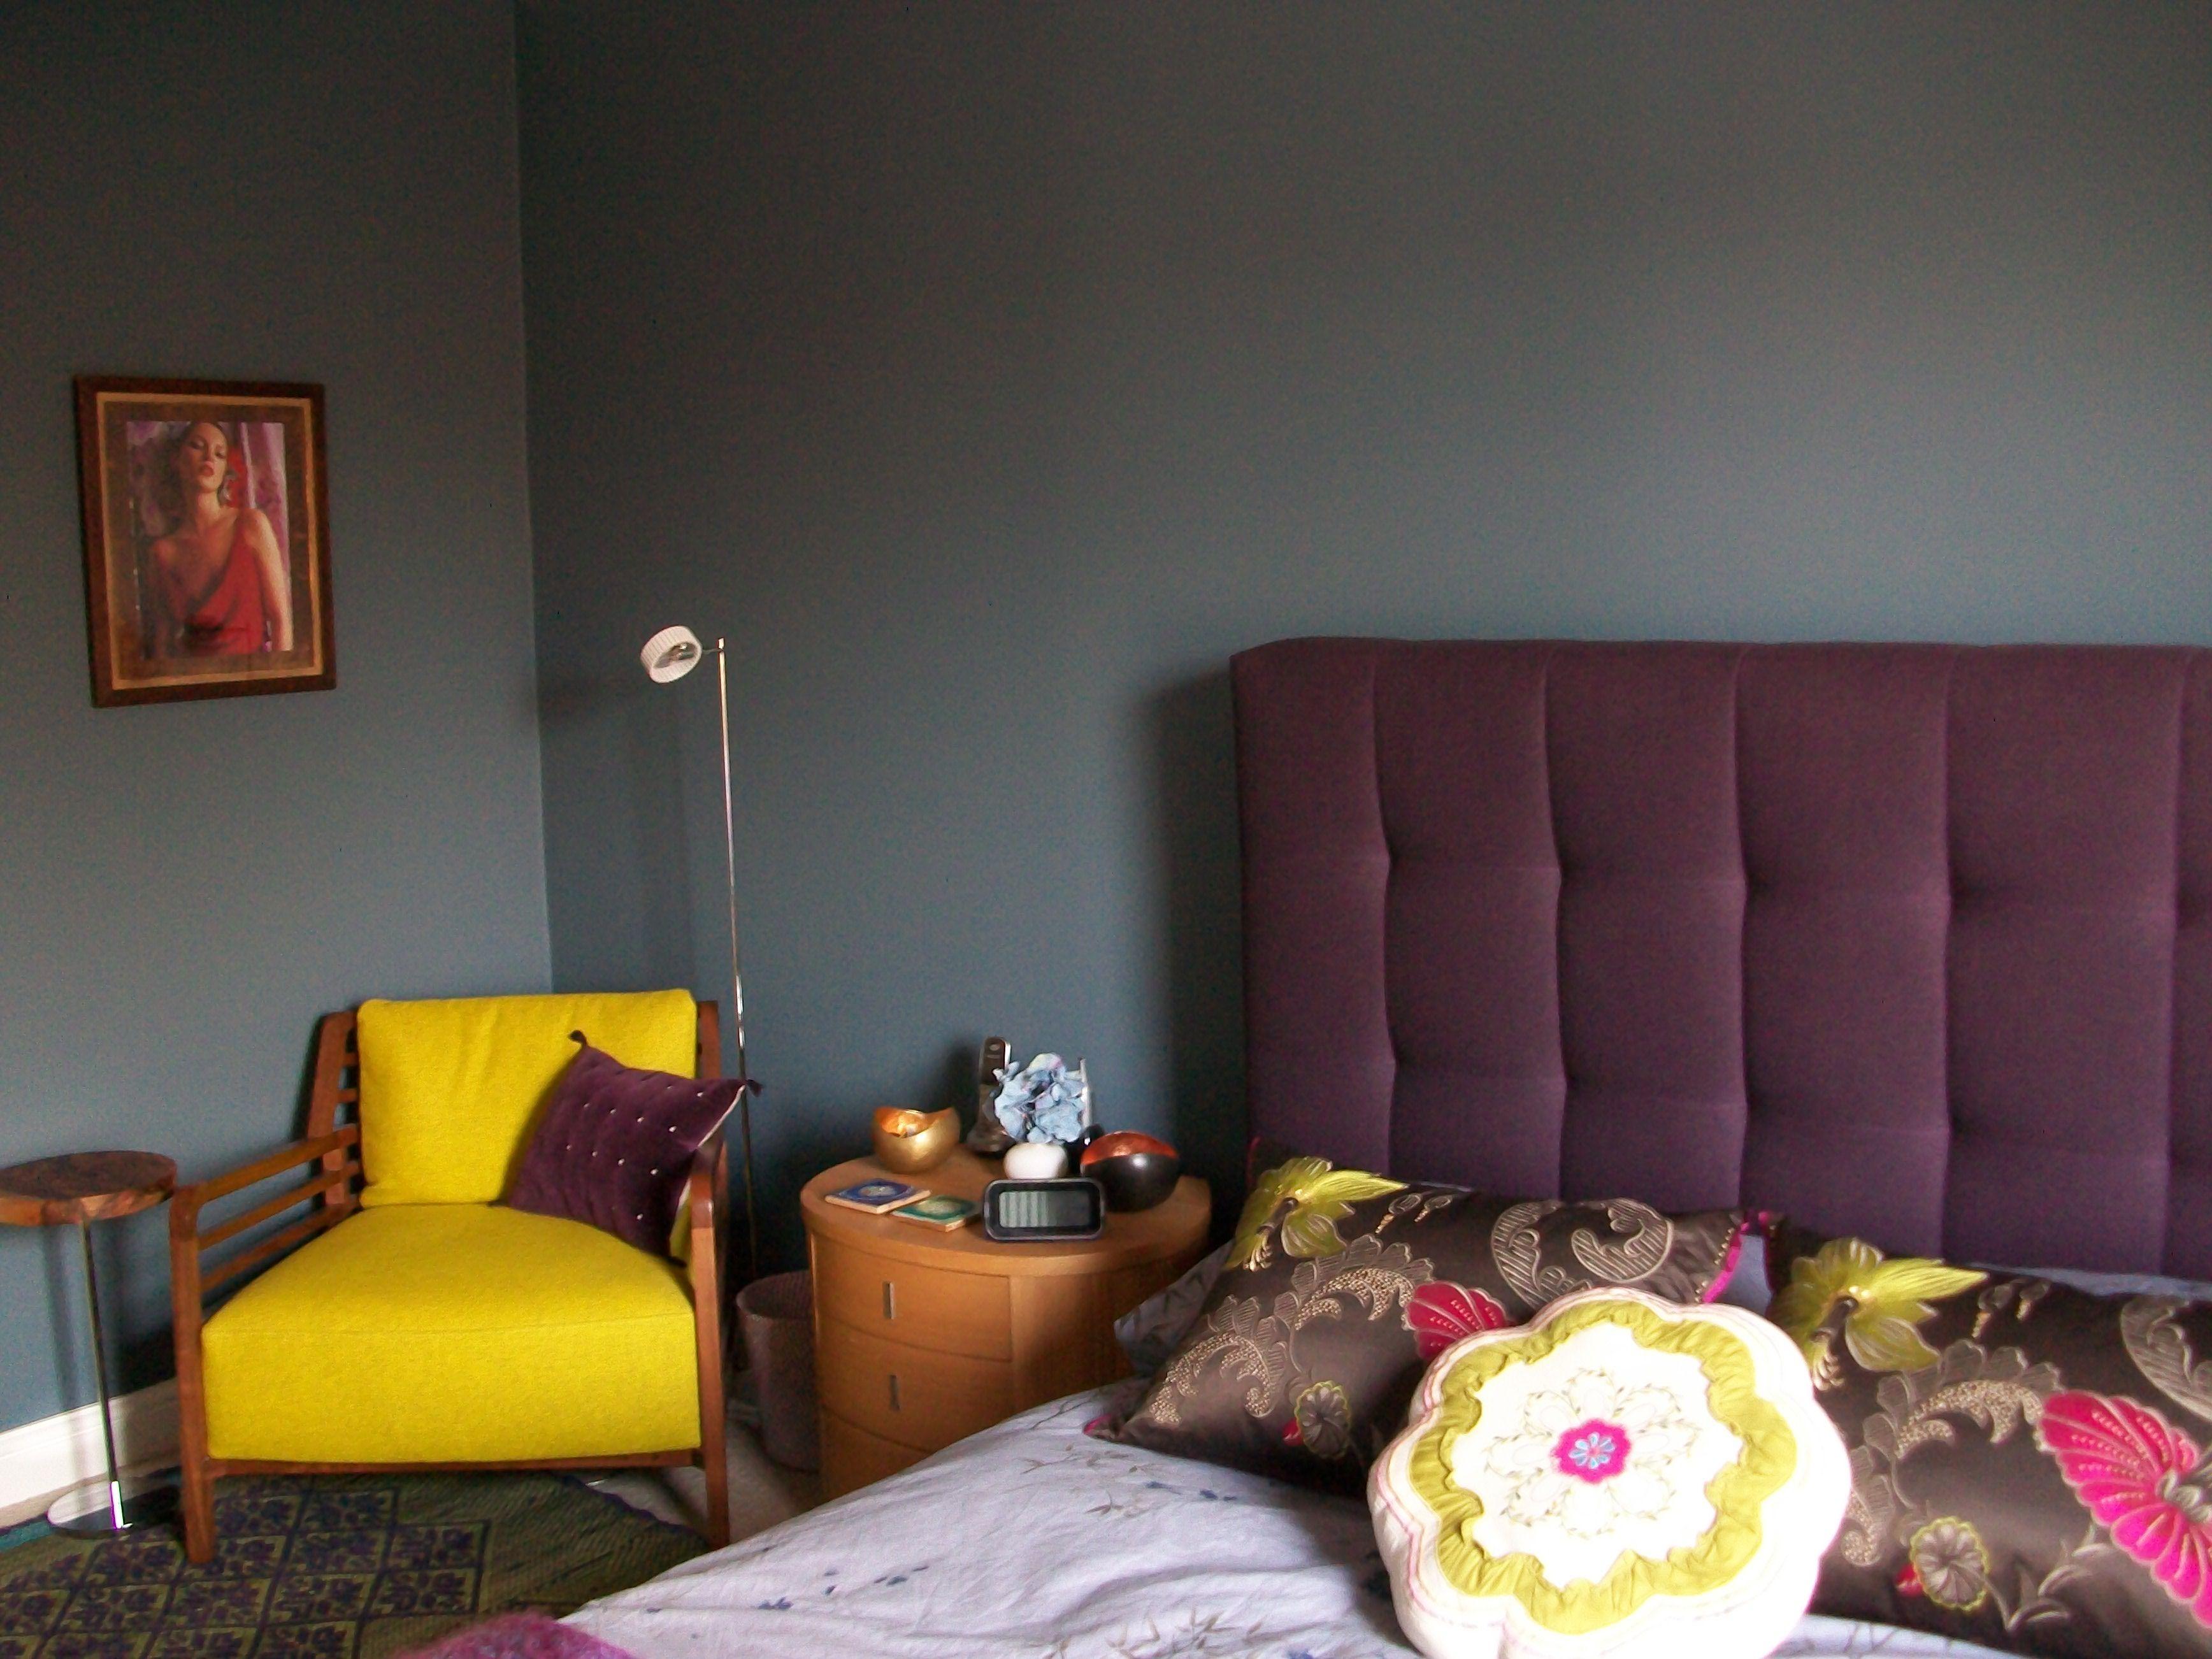 Blue bedroom dulux steel symphony 1 paint purple tufted for Blue green purple room